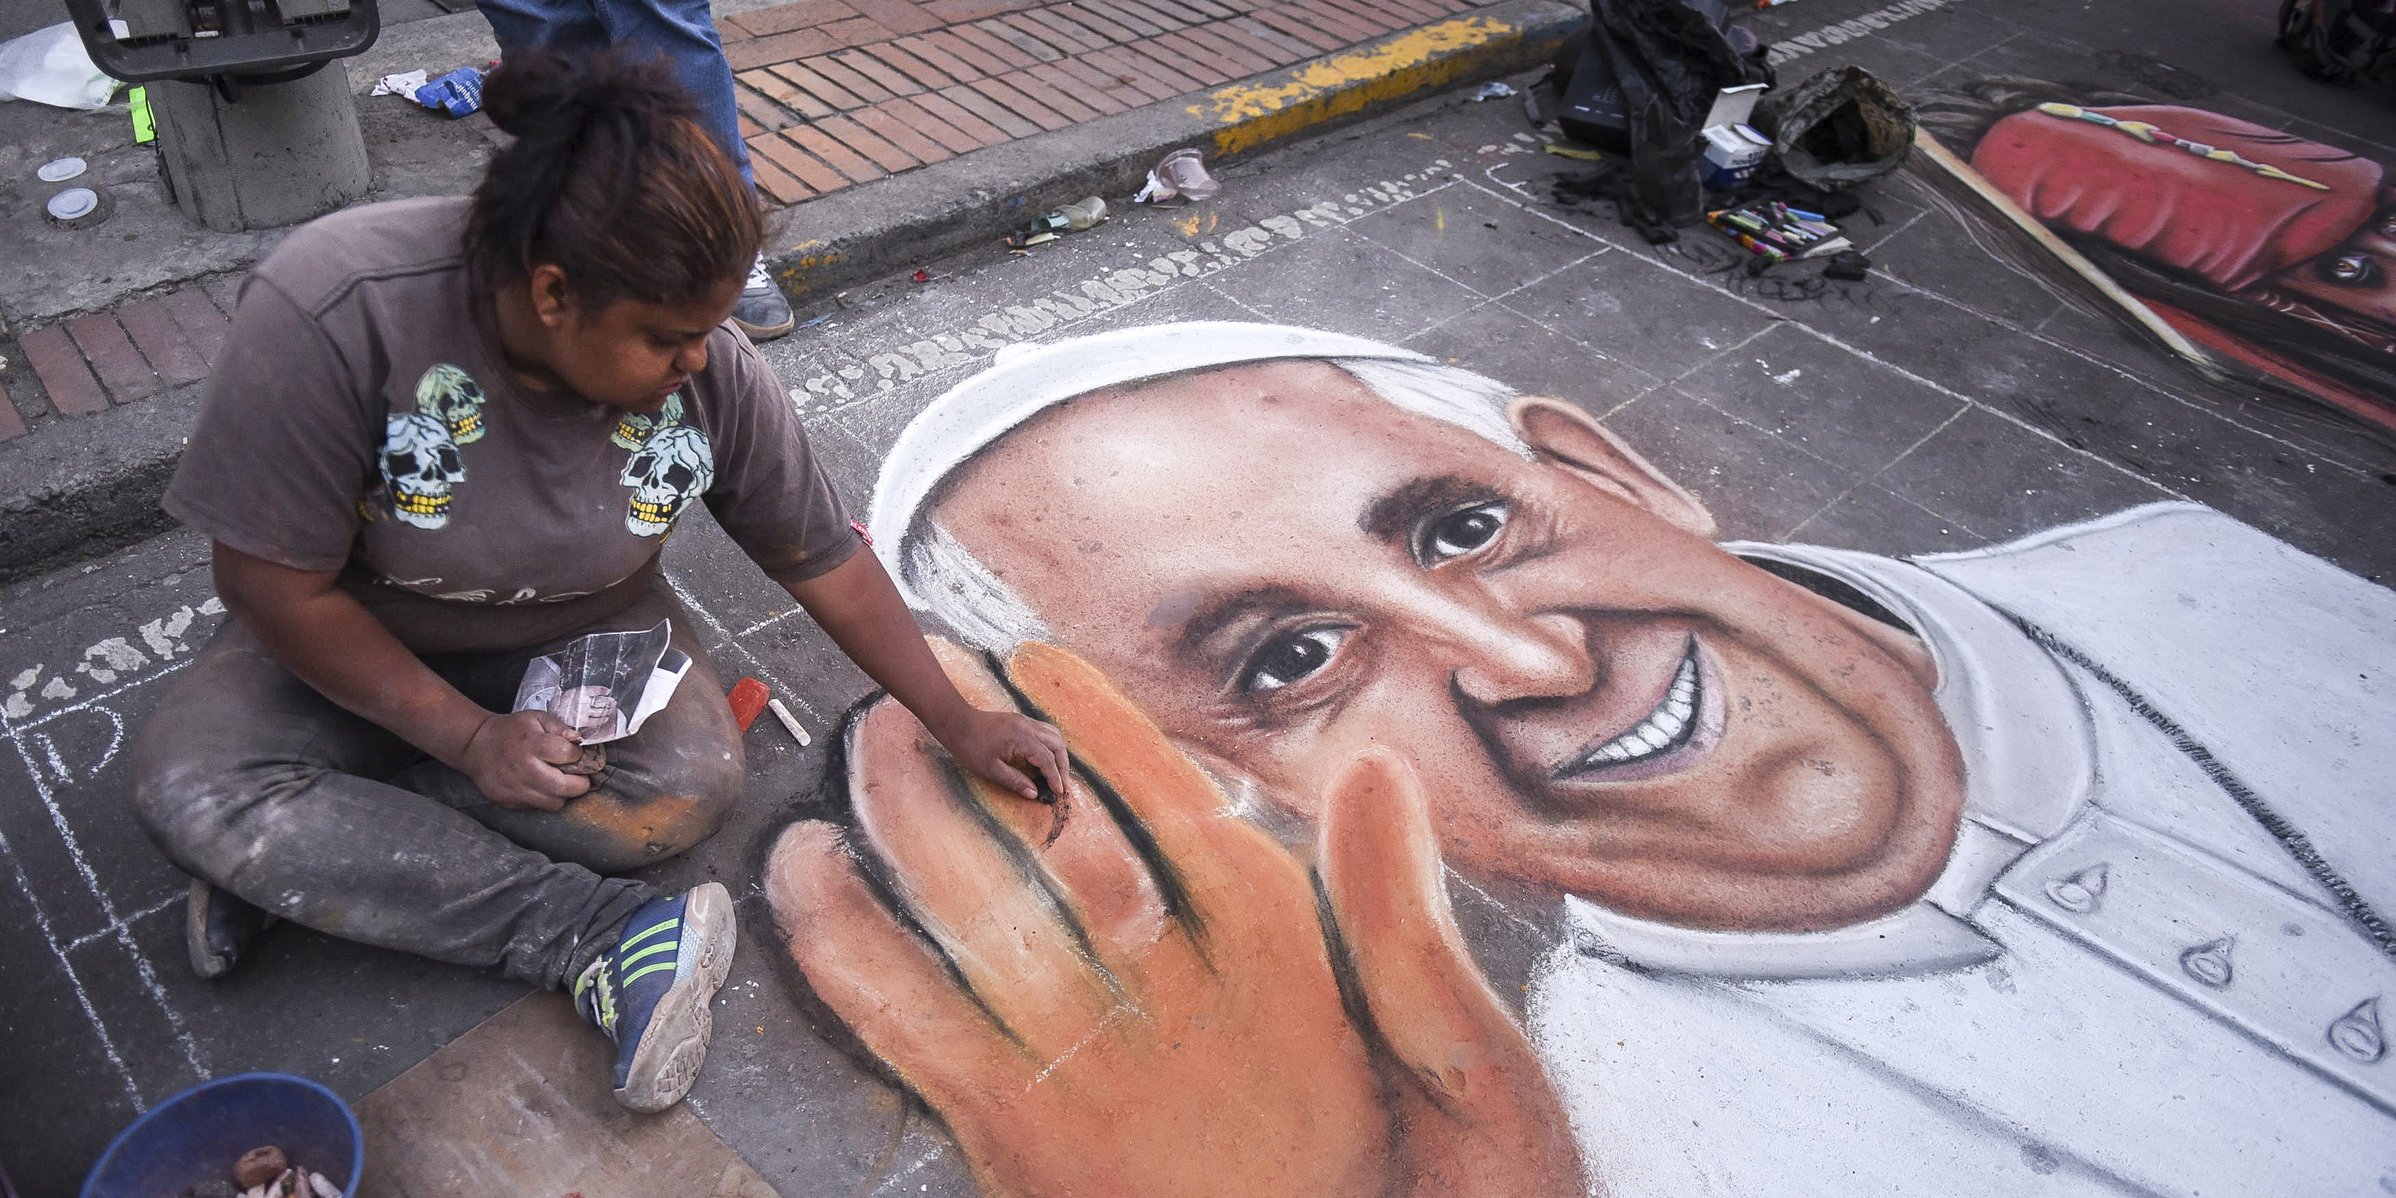 POPE ARTIST